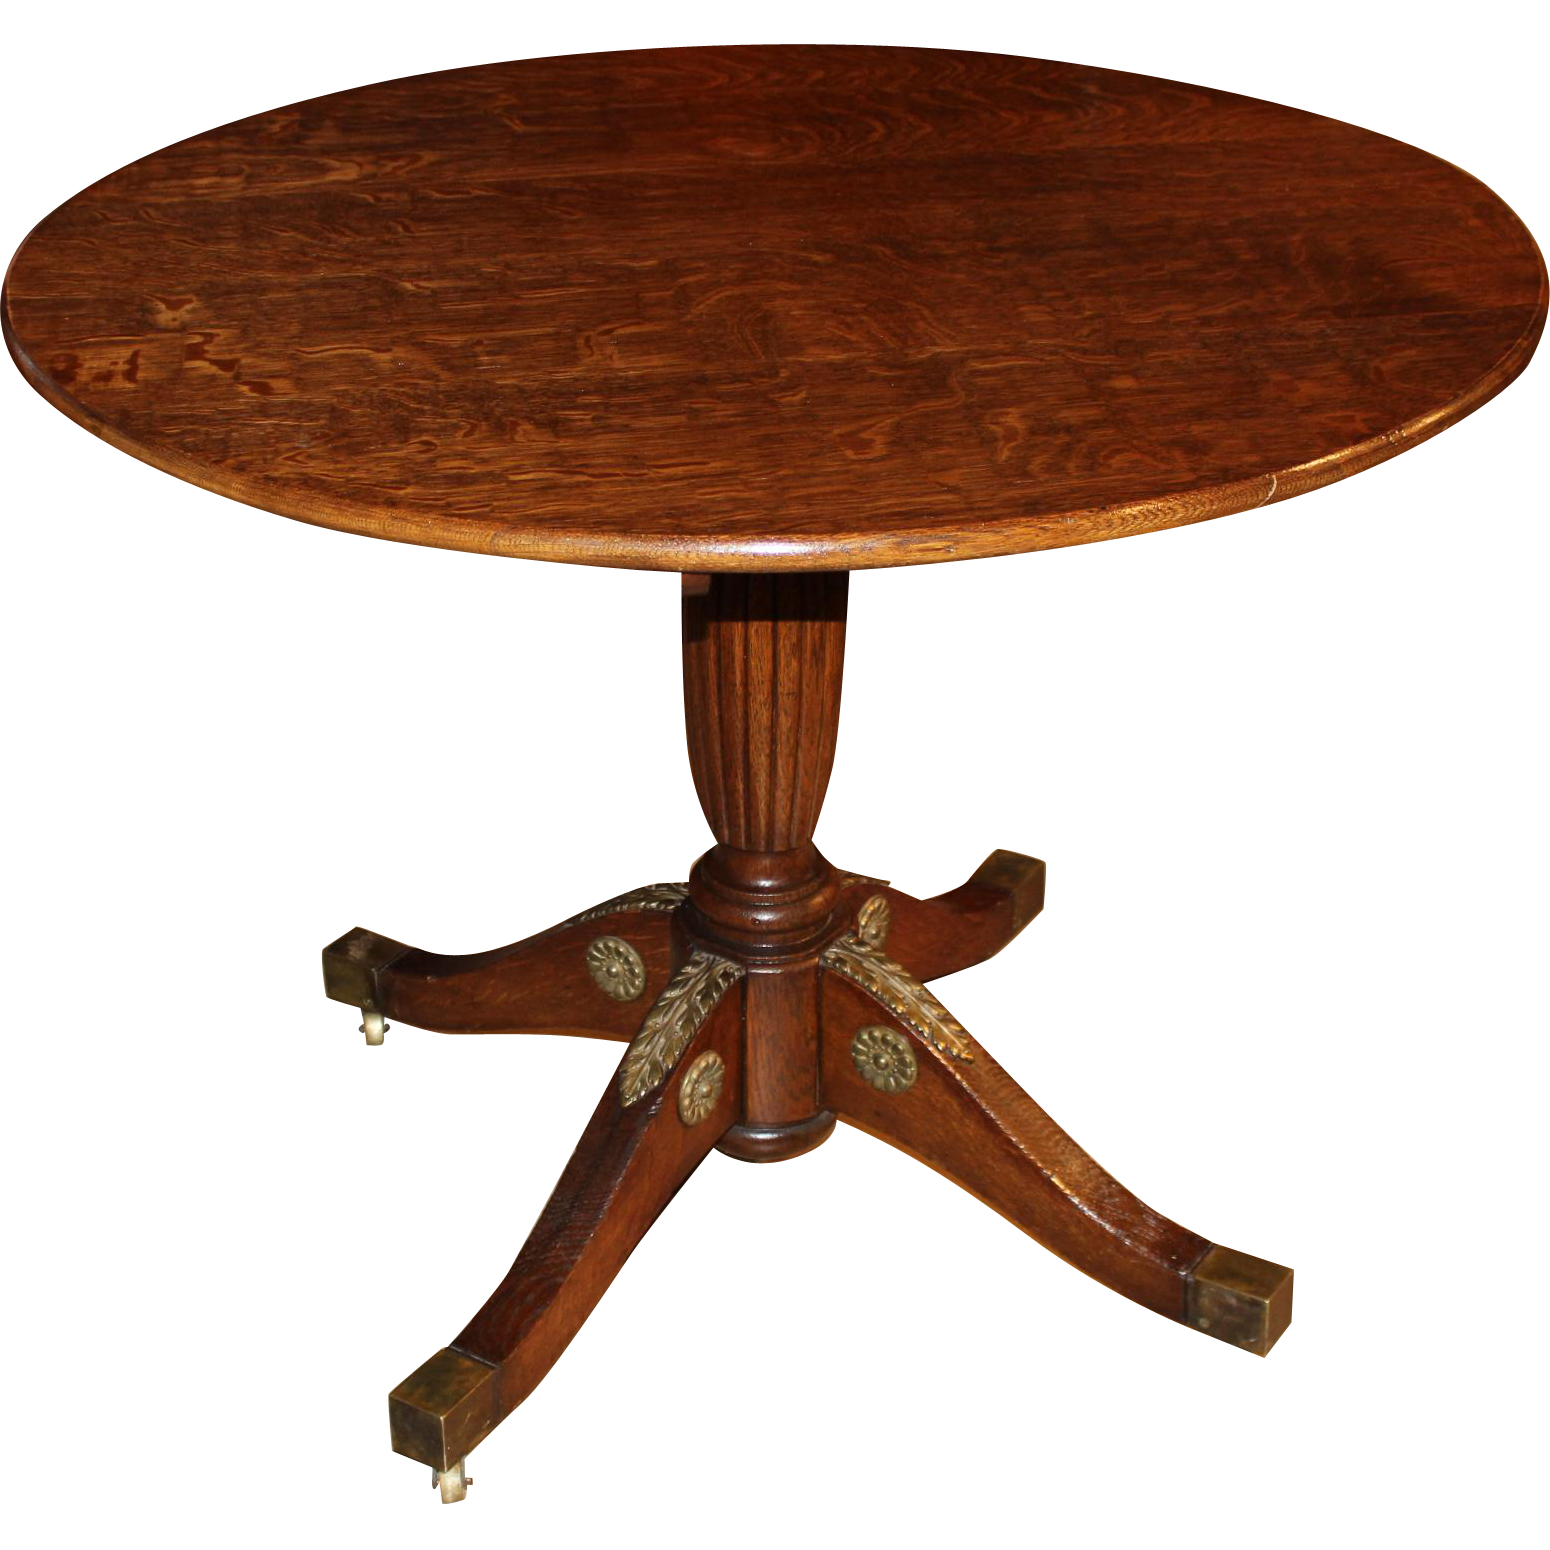 Renaissance Revival Oak Tilt Tea or Center Table circa 1870's